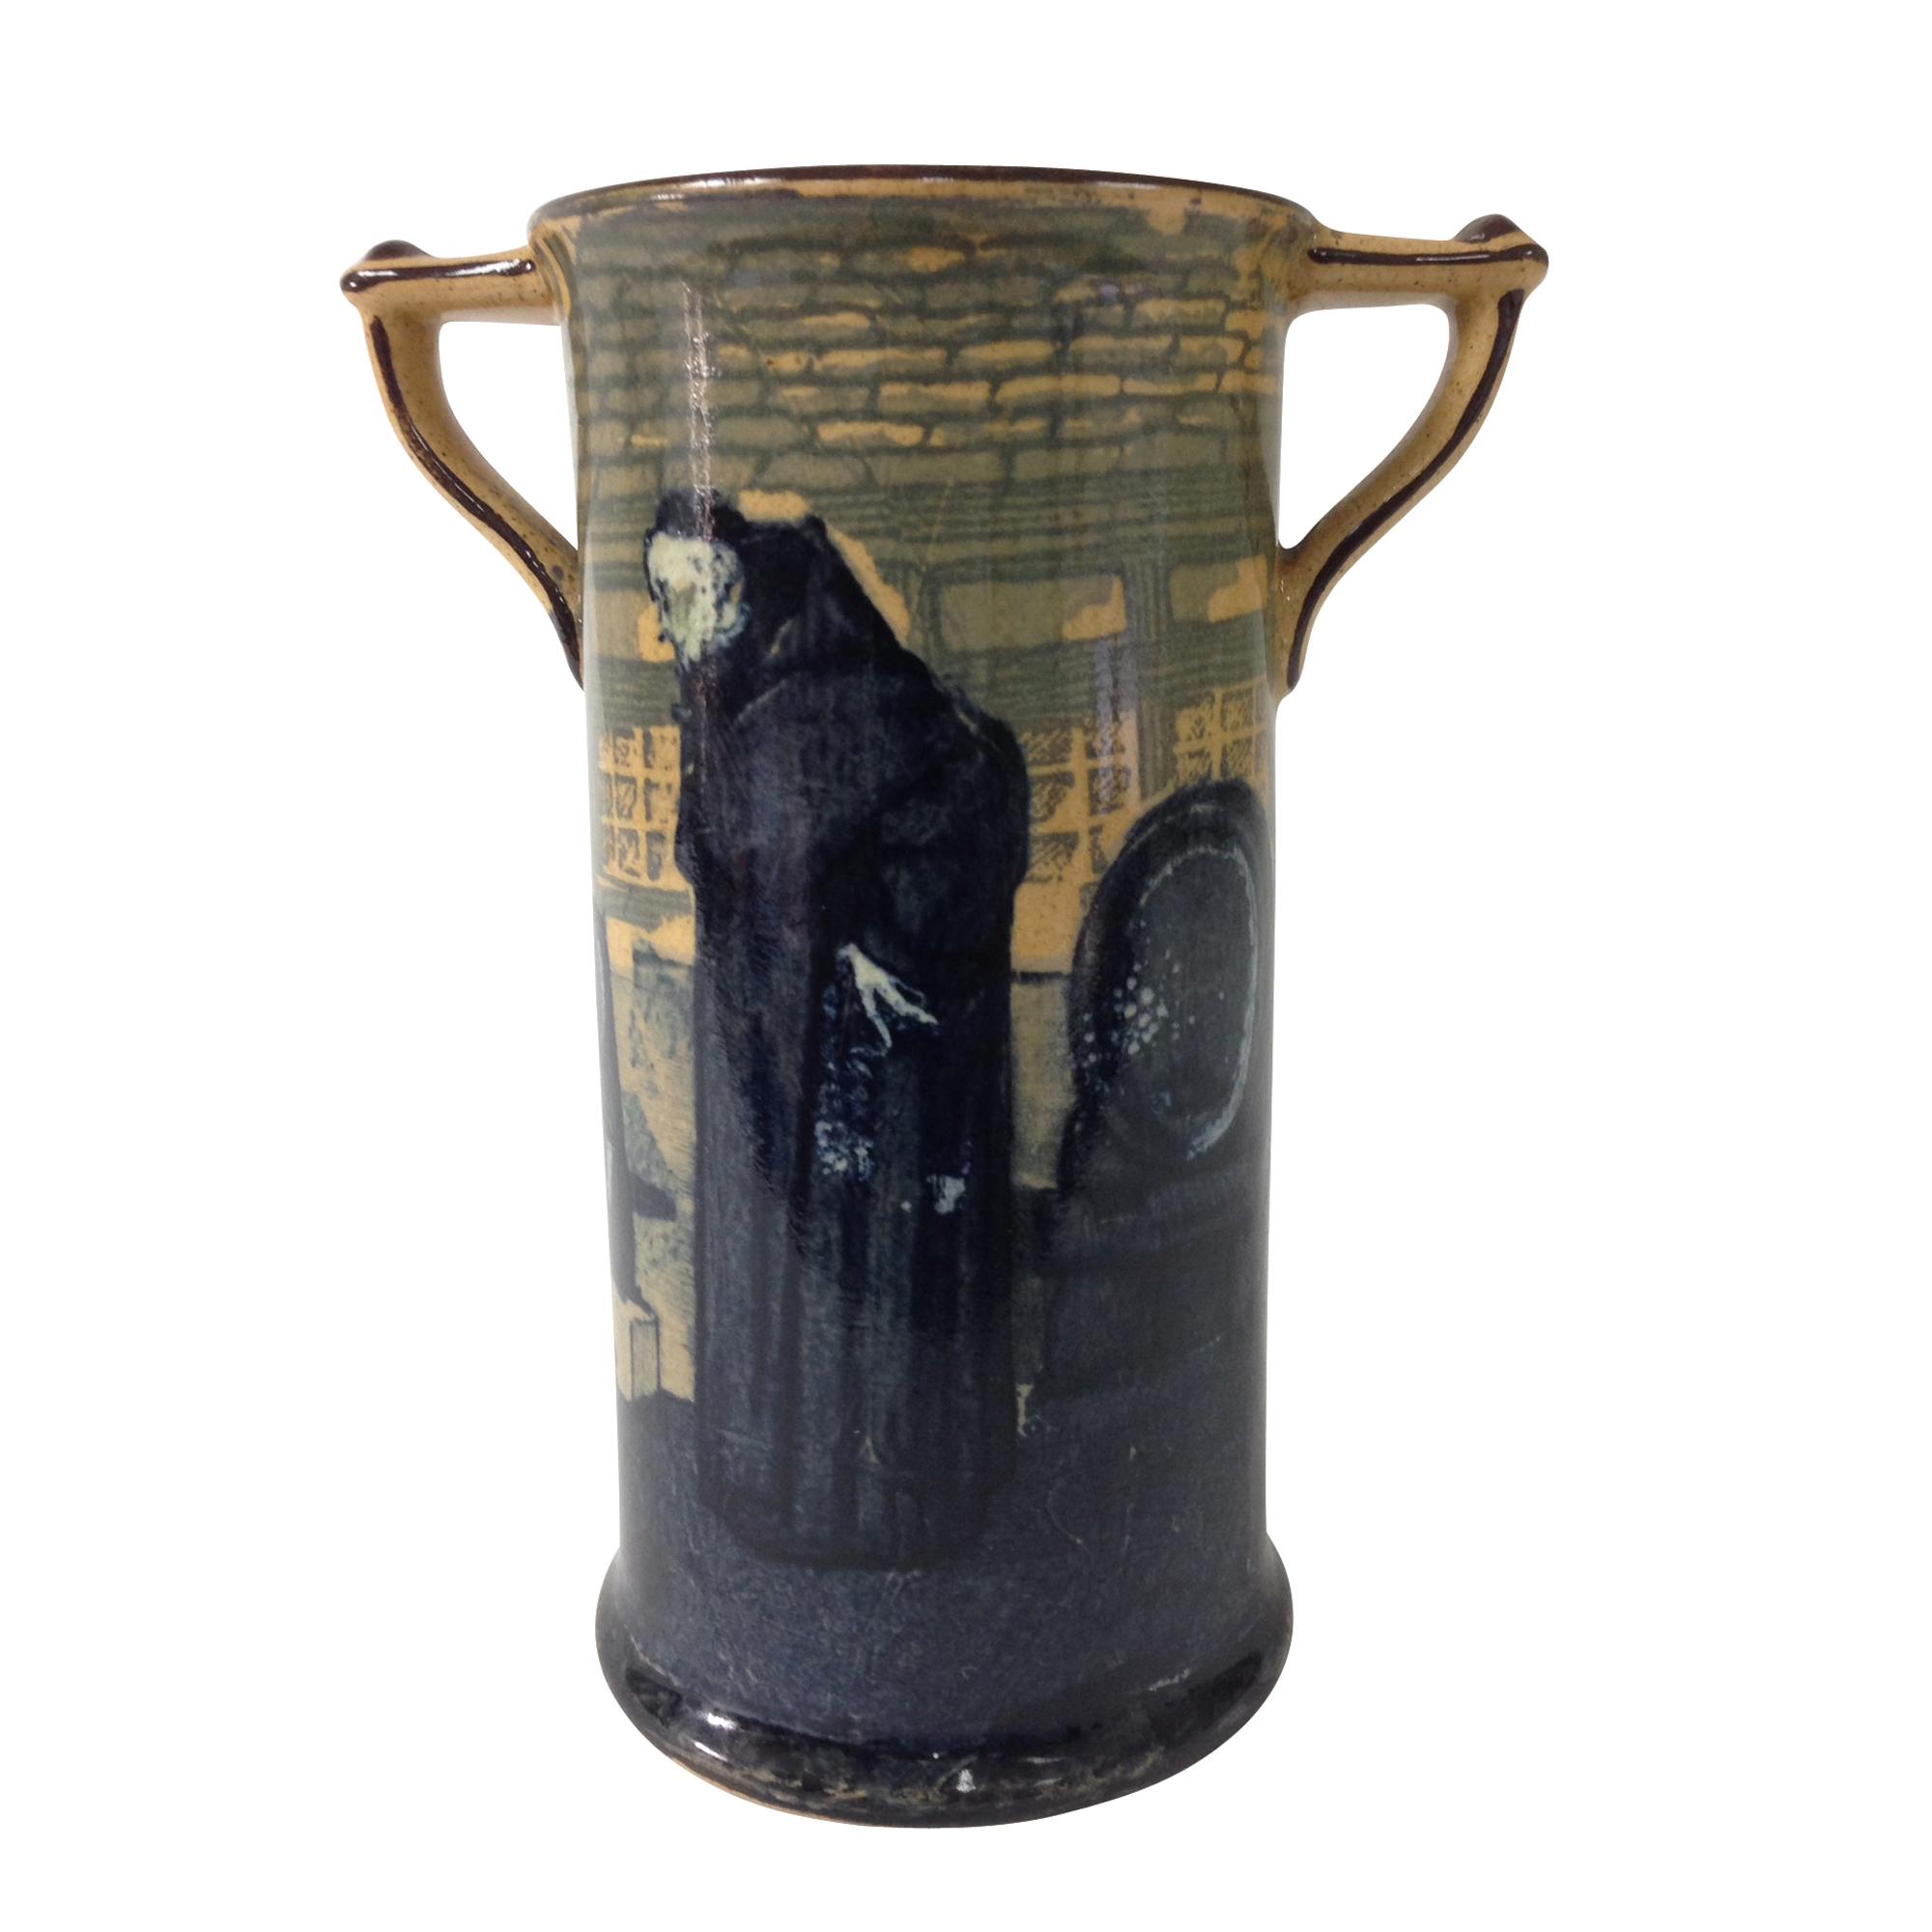 Monks in the Cellar Vase - Royal Doulton Seriesware